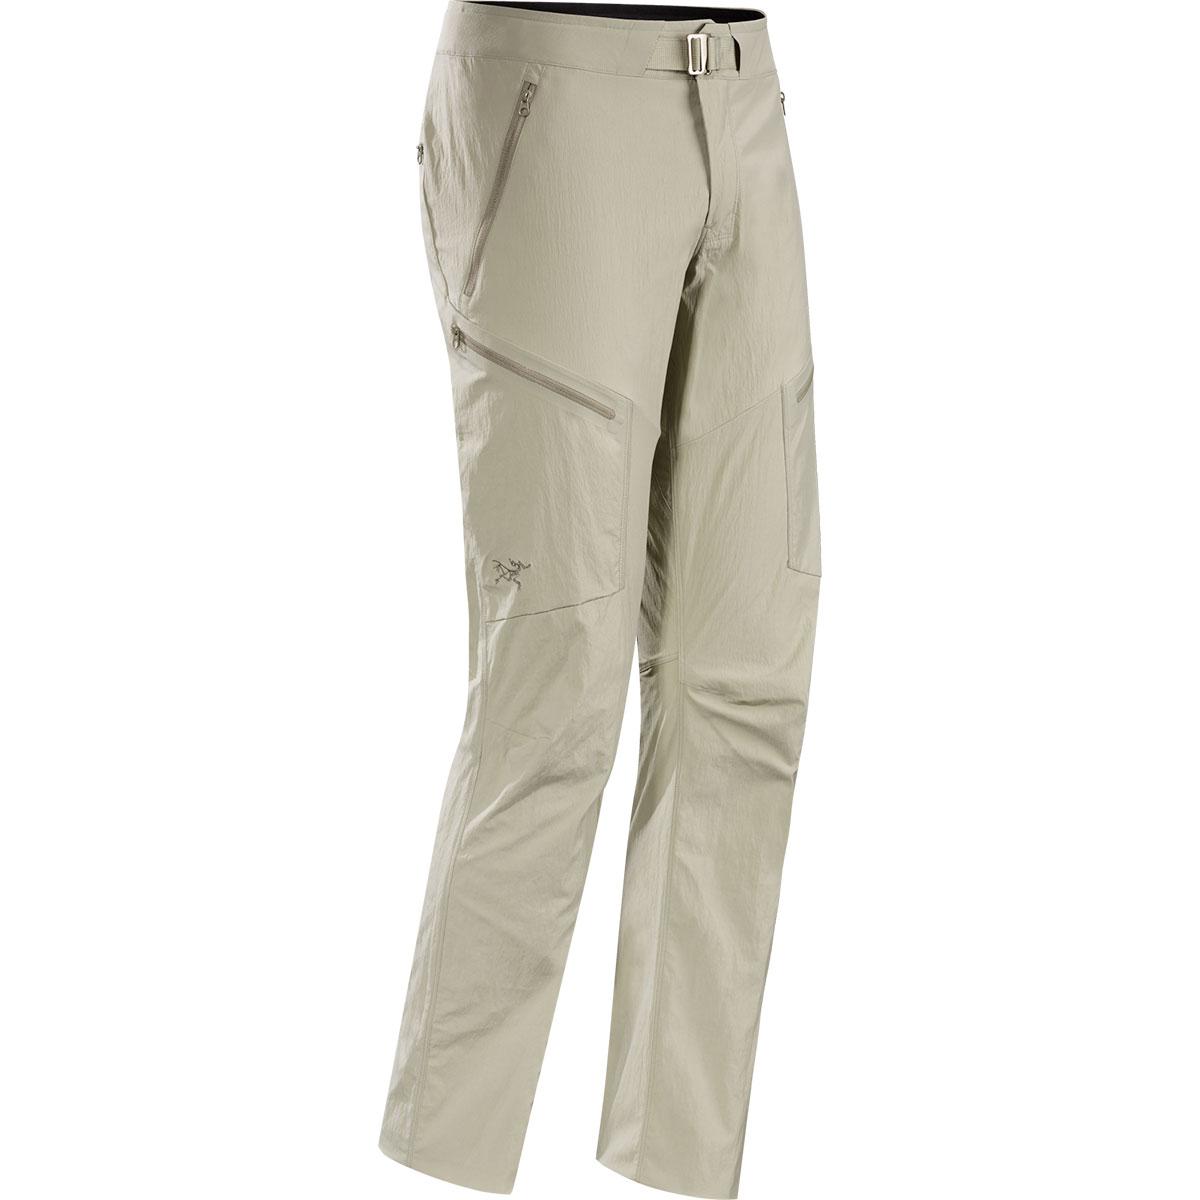 Arc'teryx Palisade Pant, men's, discontinued 2017 model